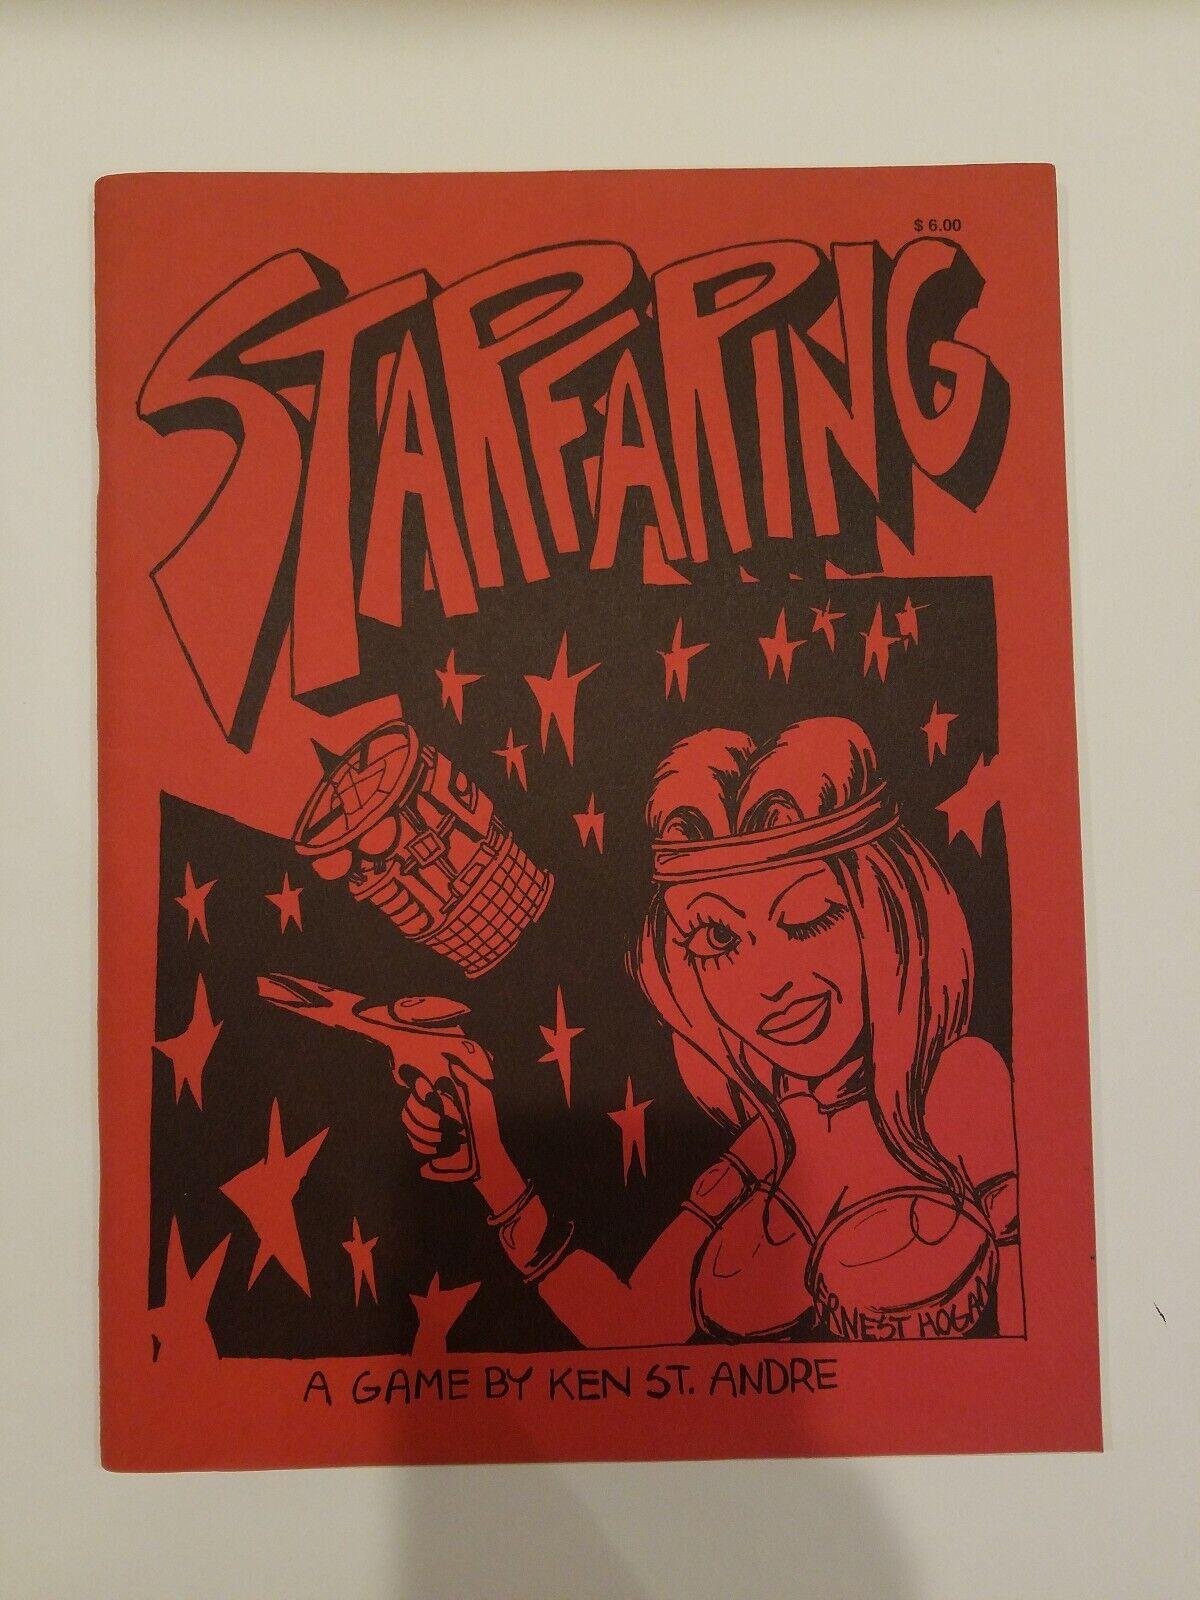 Libro de juego de fantasía Estrellafaring por Ken St. Andre 1976 - 1st edición 1st impresión rara